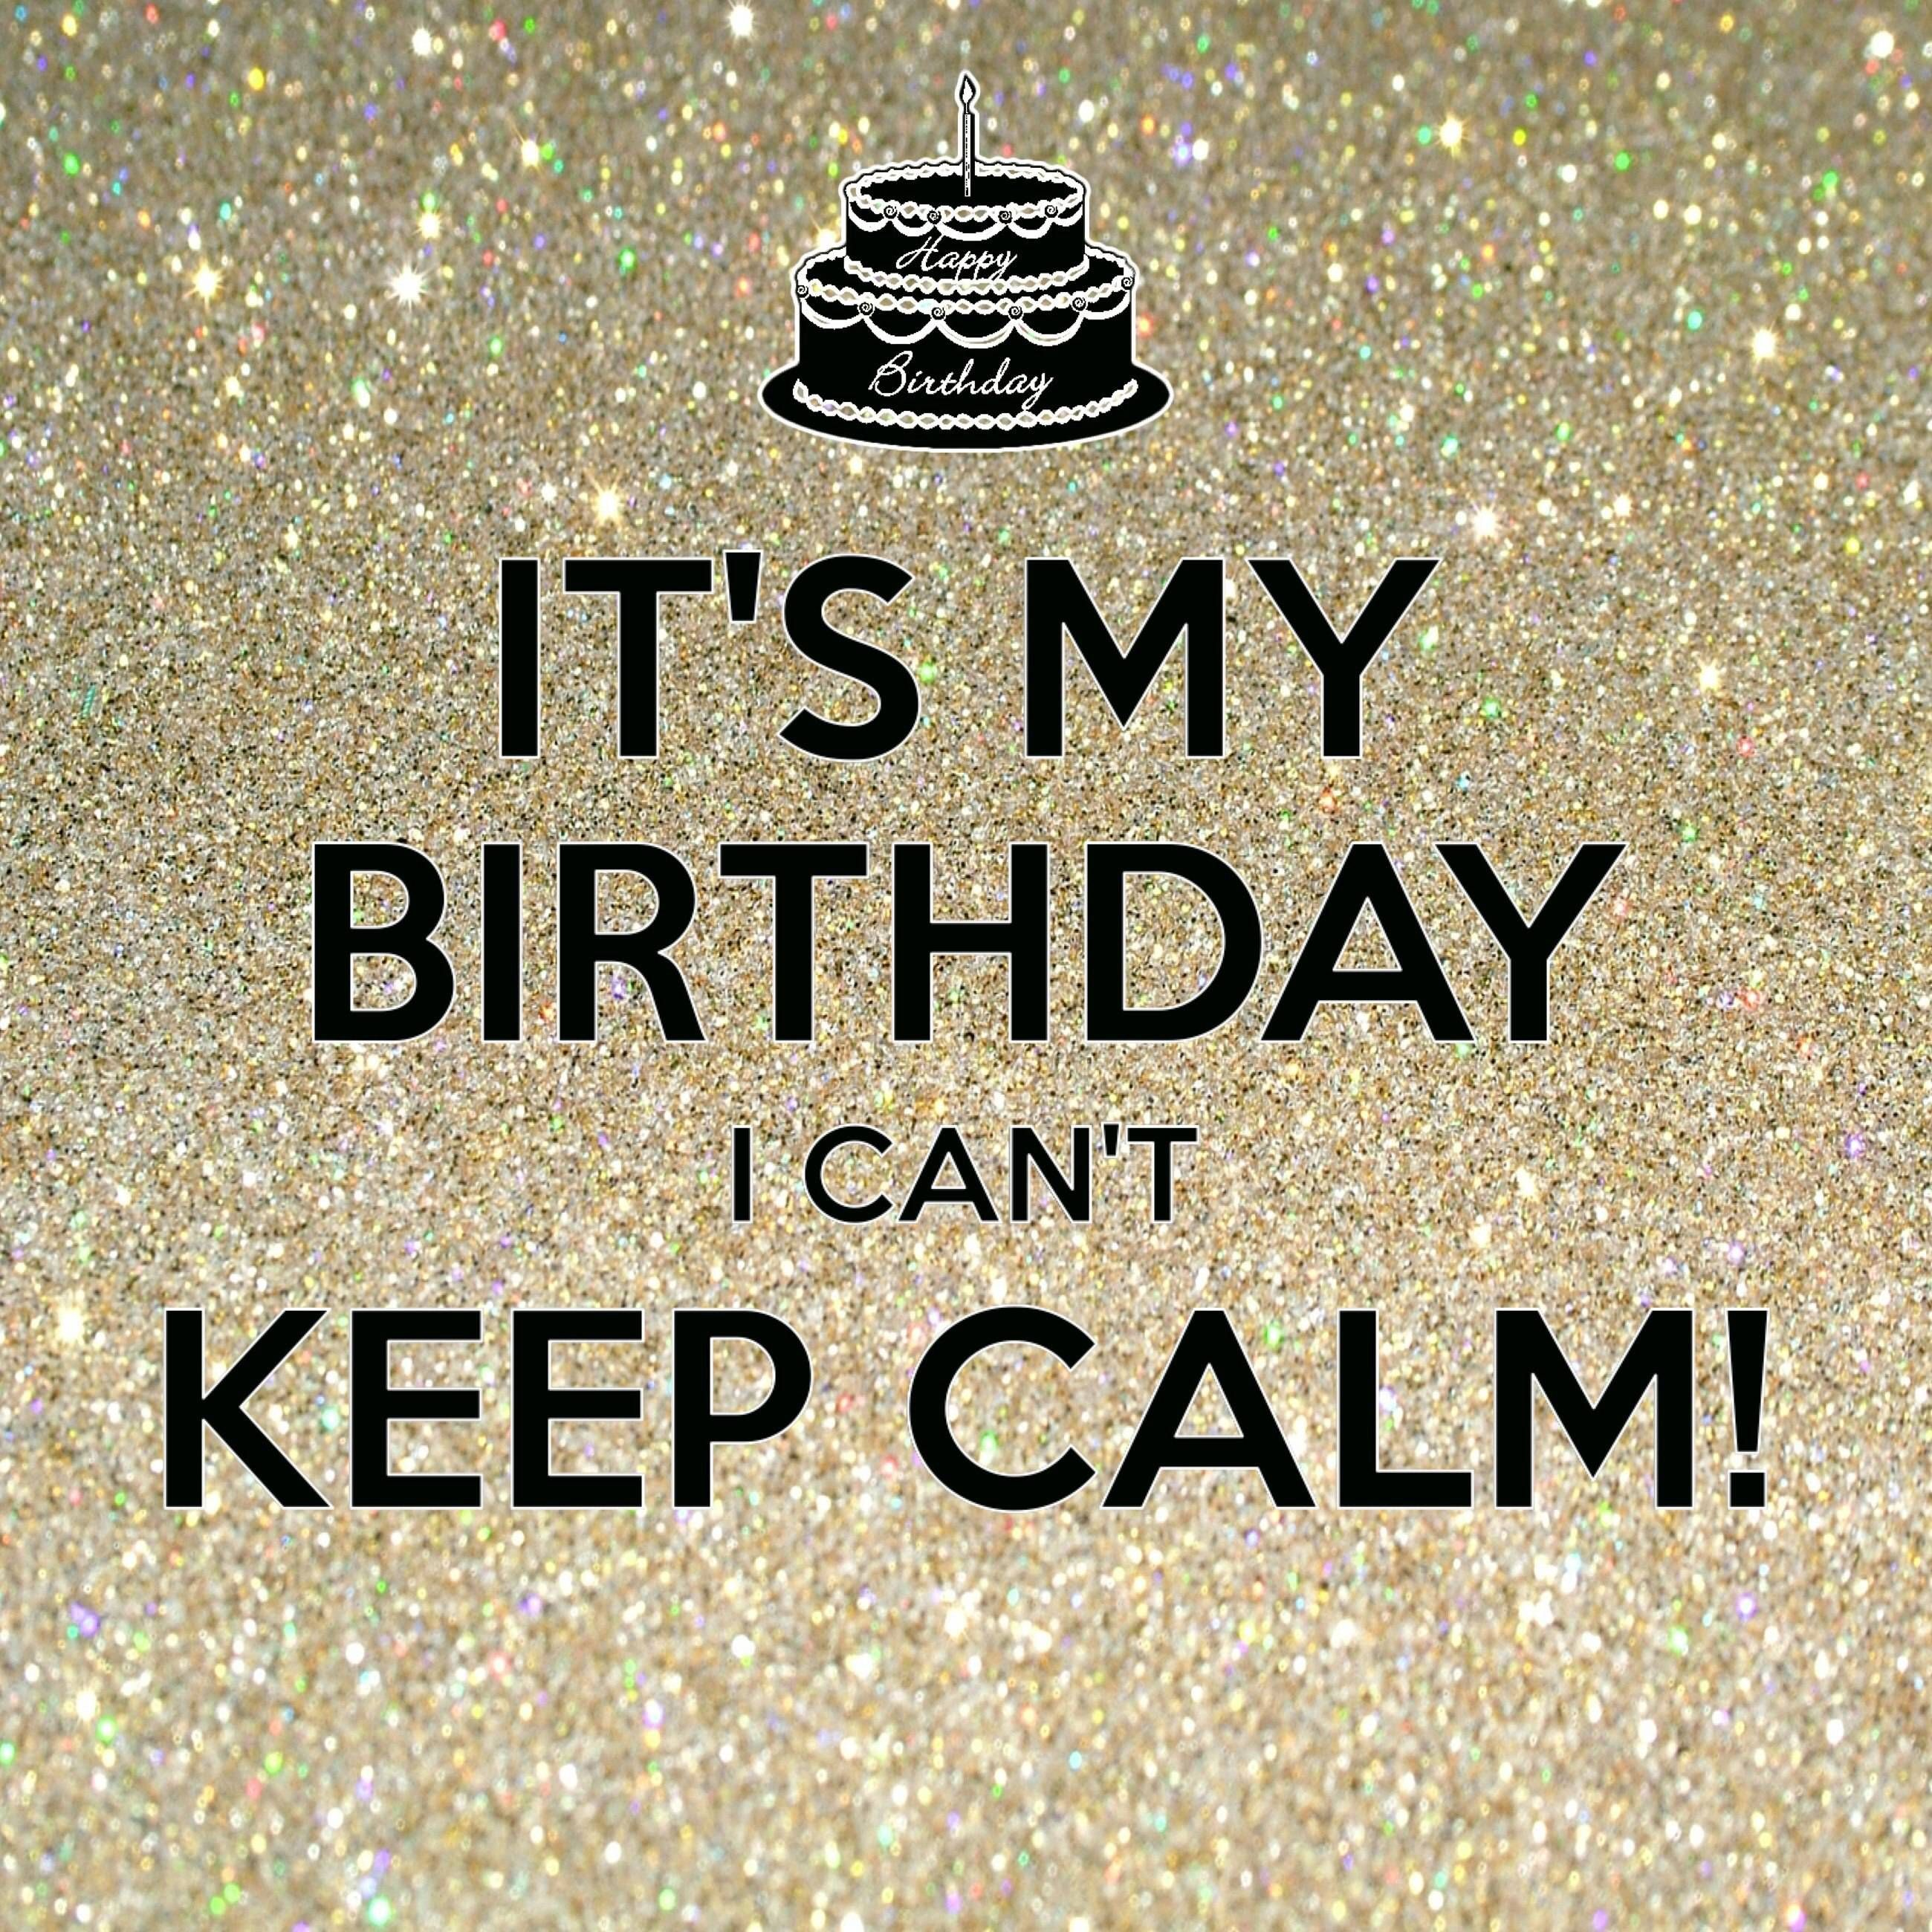 It's My Birthday I Can't Keep Calm! / created with Keep